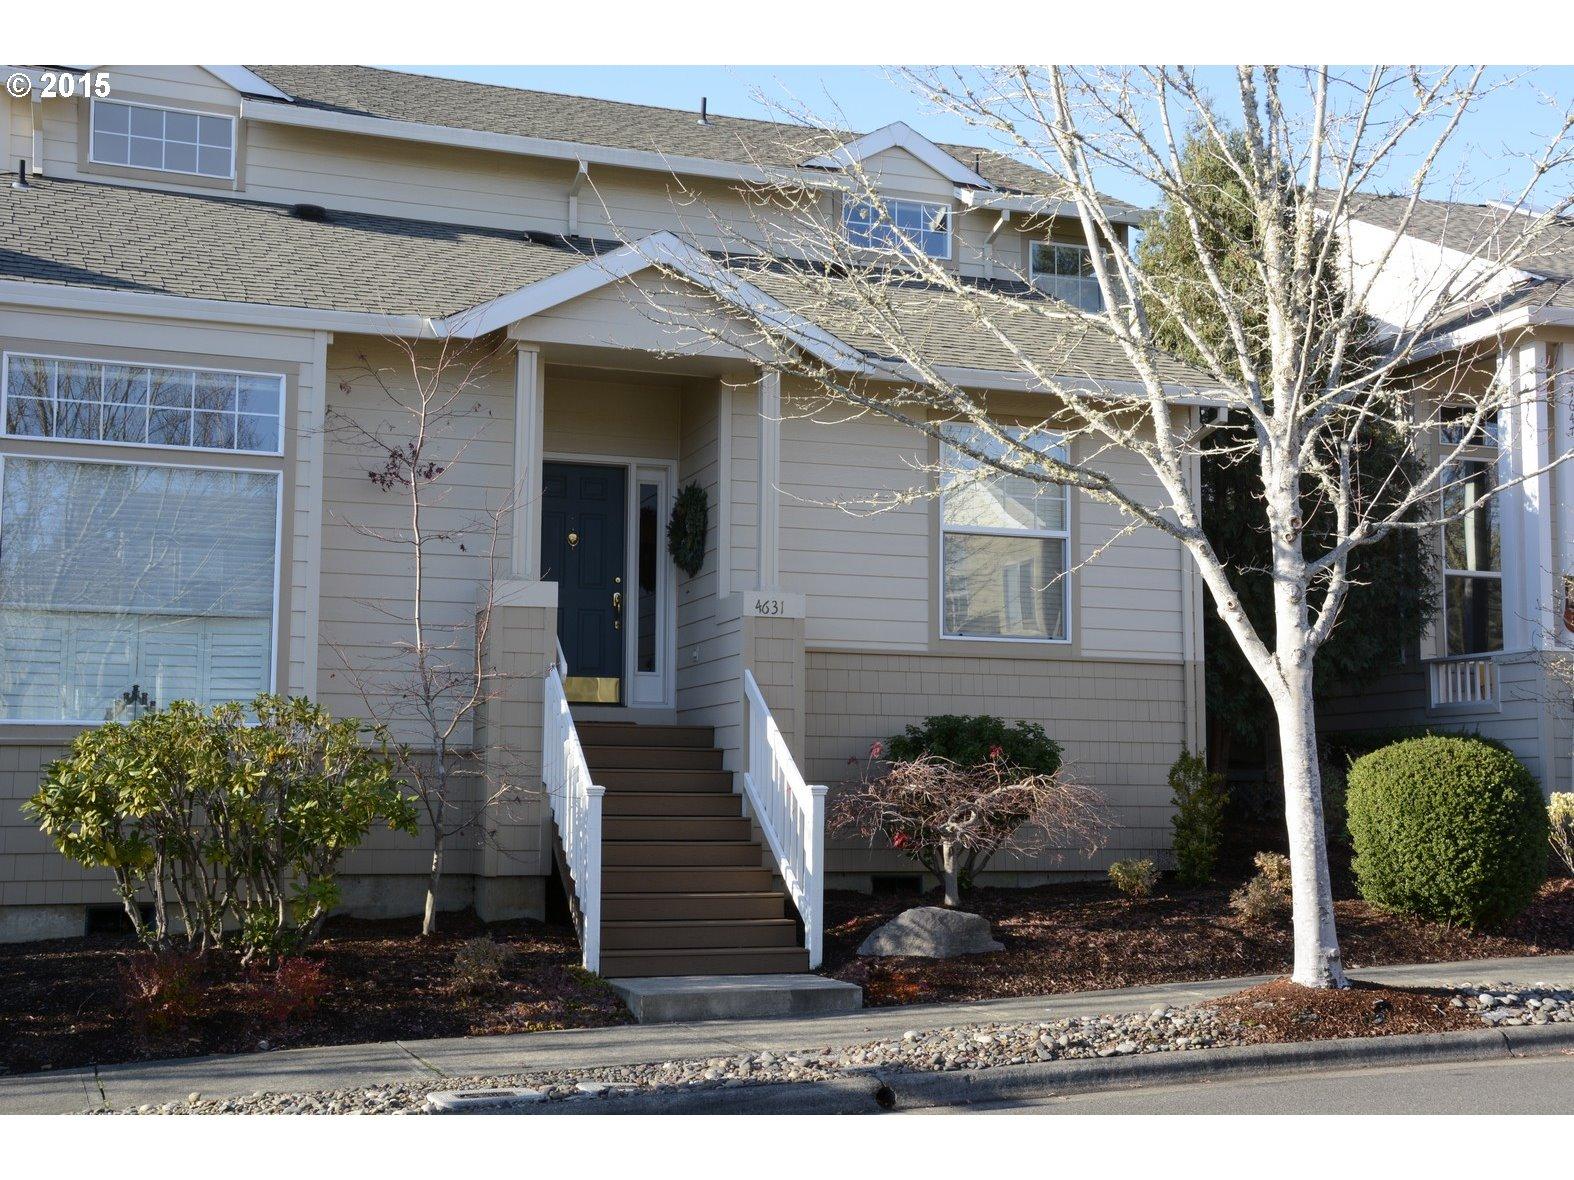 4631 NW HUSERIK DR, Portland OR 97229